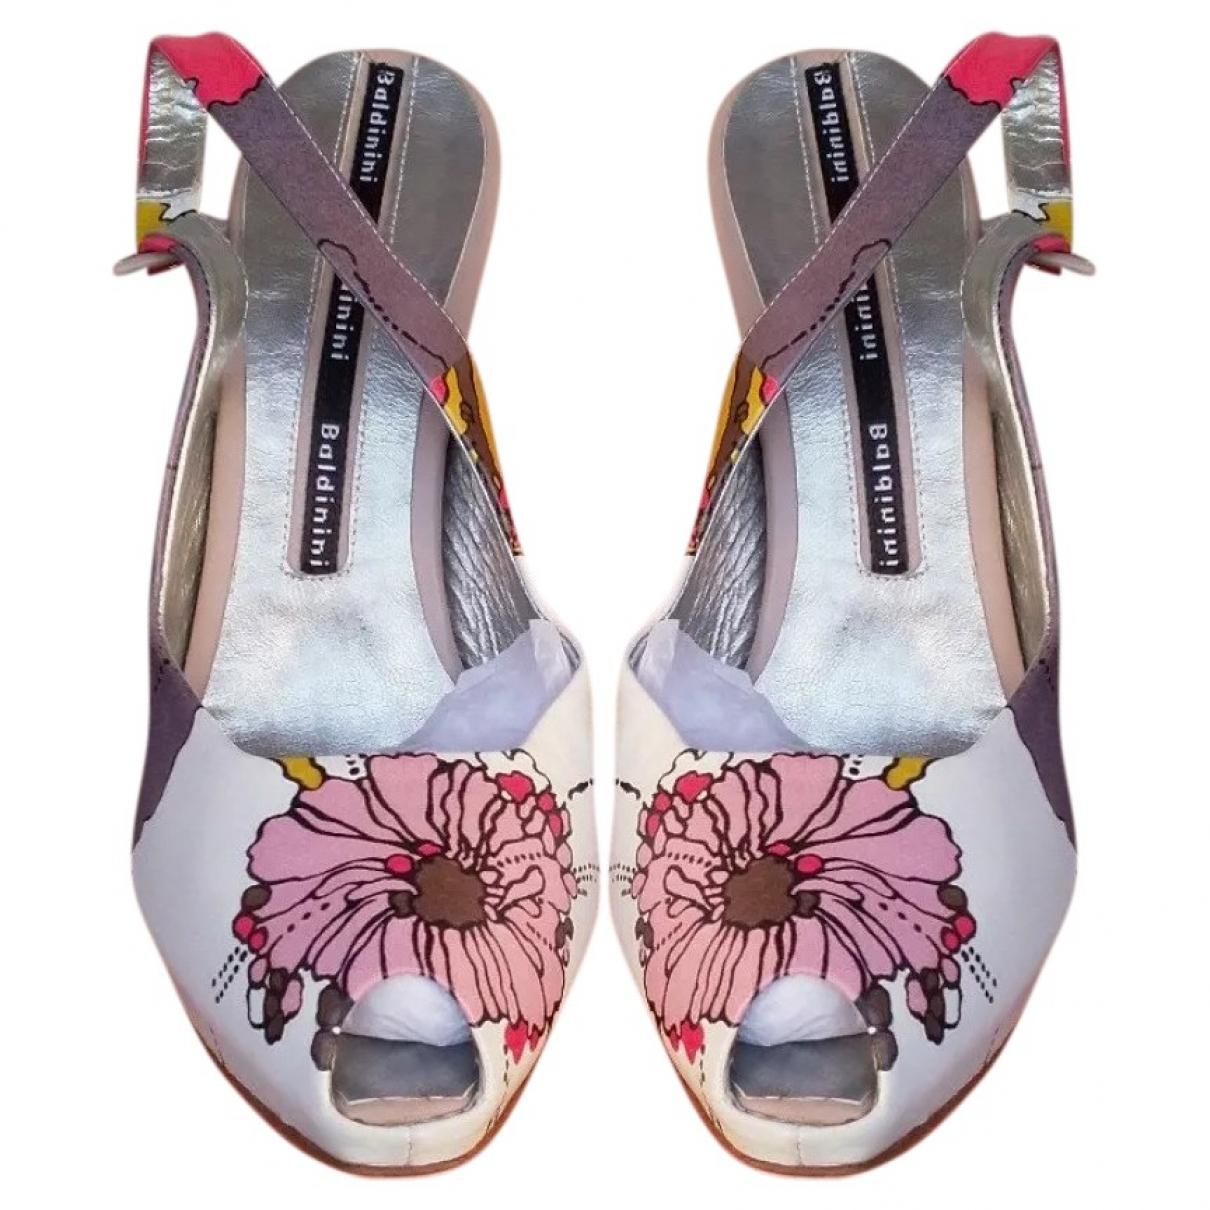 Baldinini \N Multicolour Leather Sandals for Women 40 EU